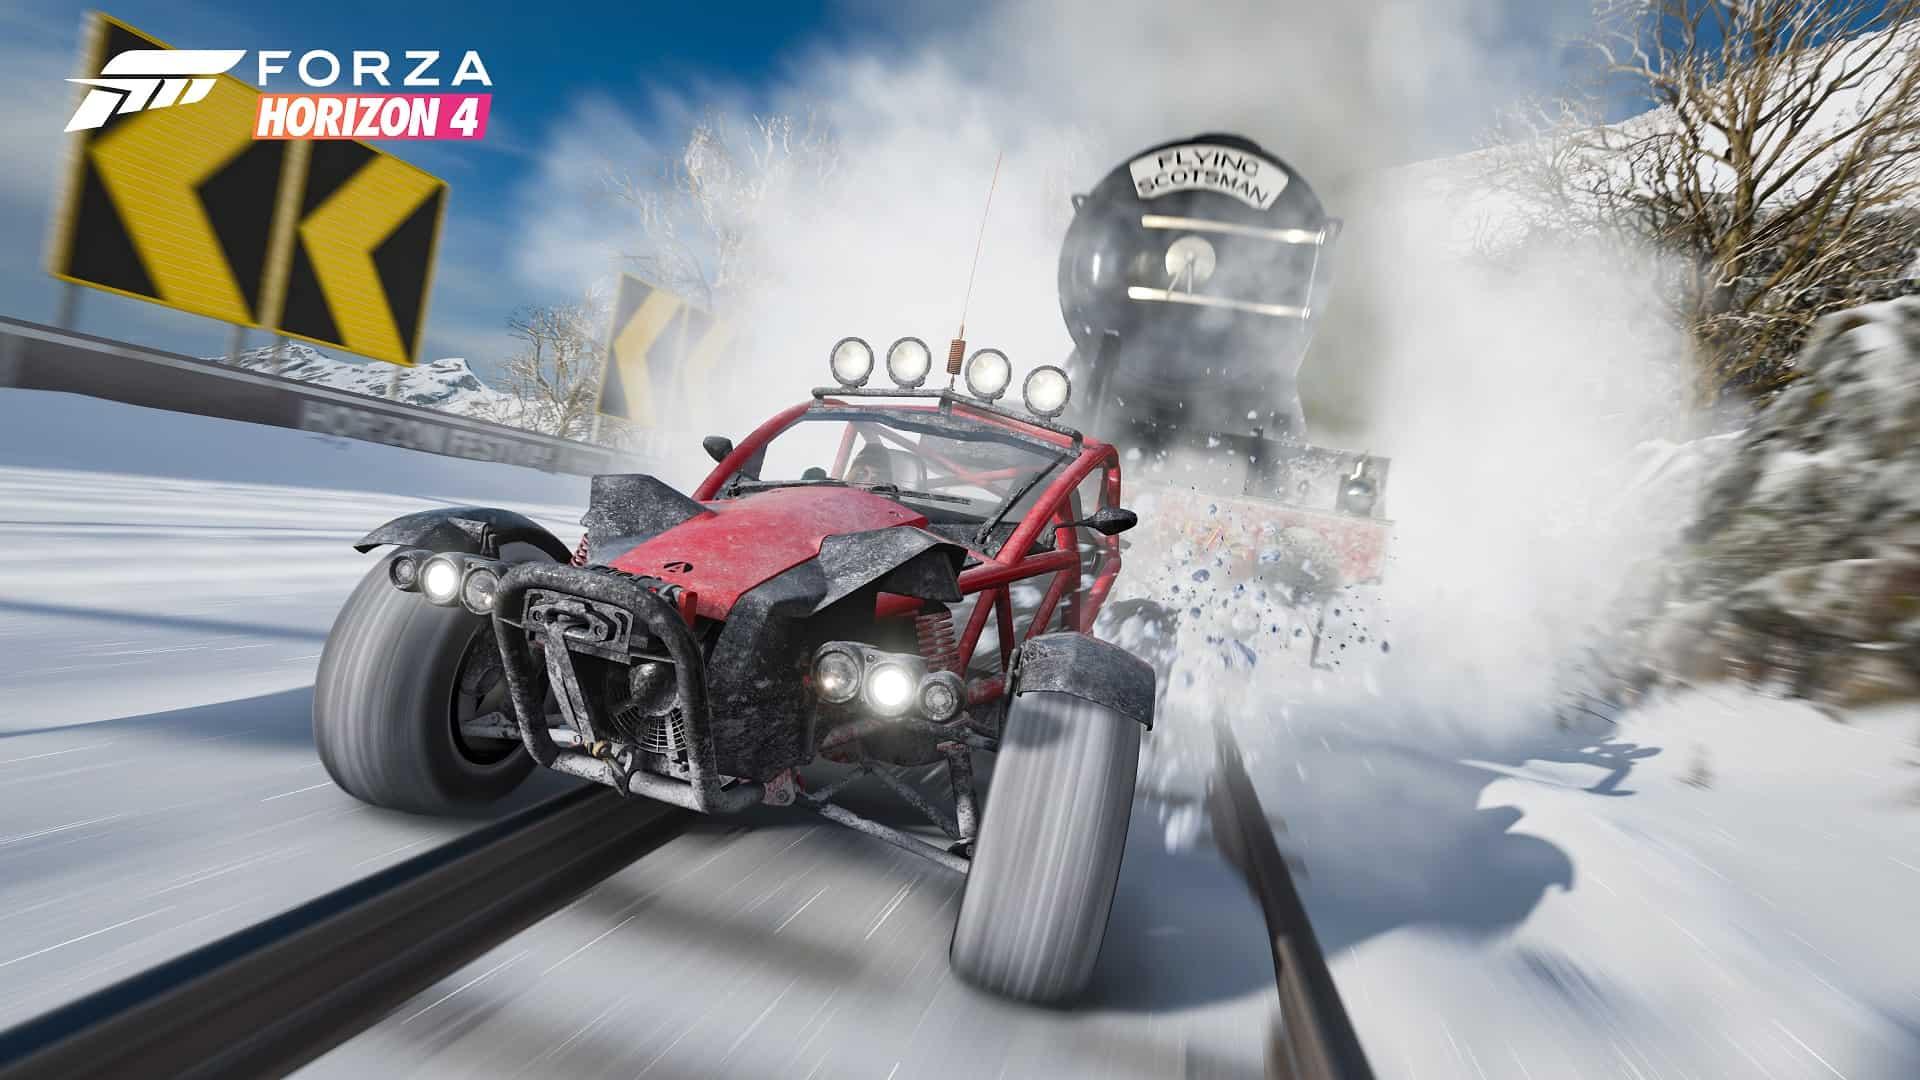 Forza Horizon 4 - Test, Review, Kaufberatung